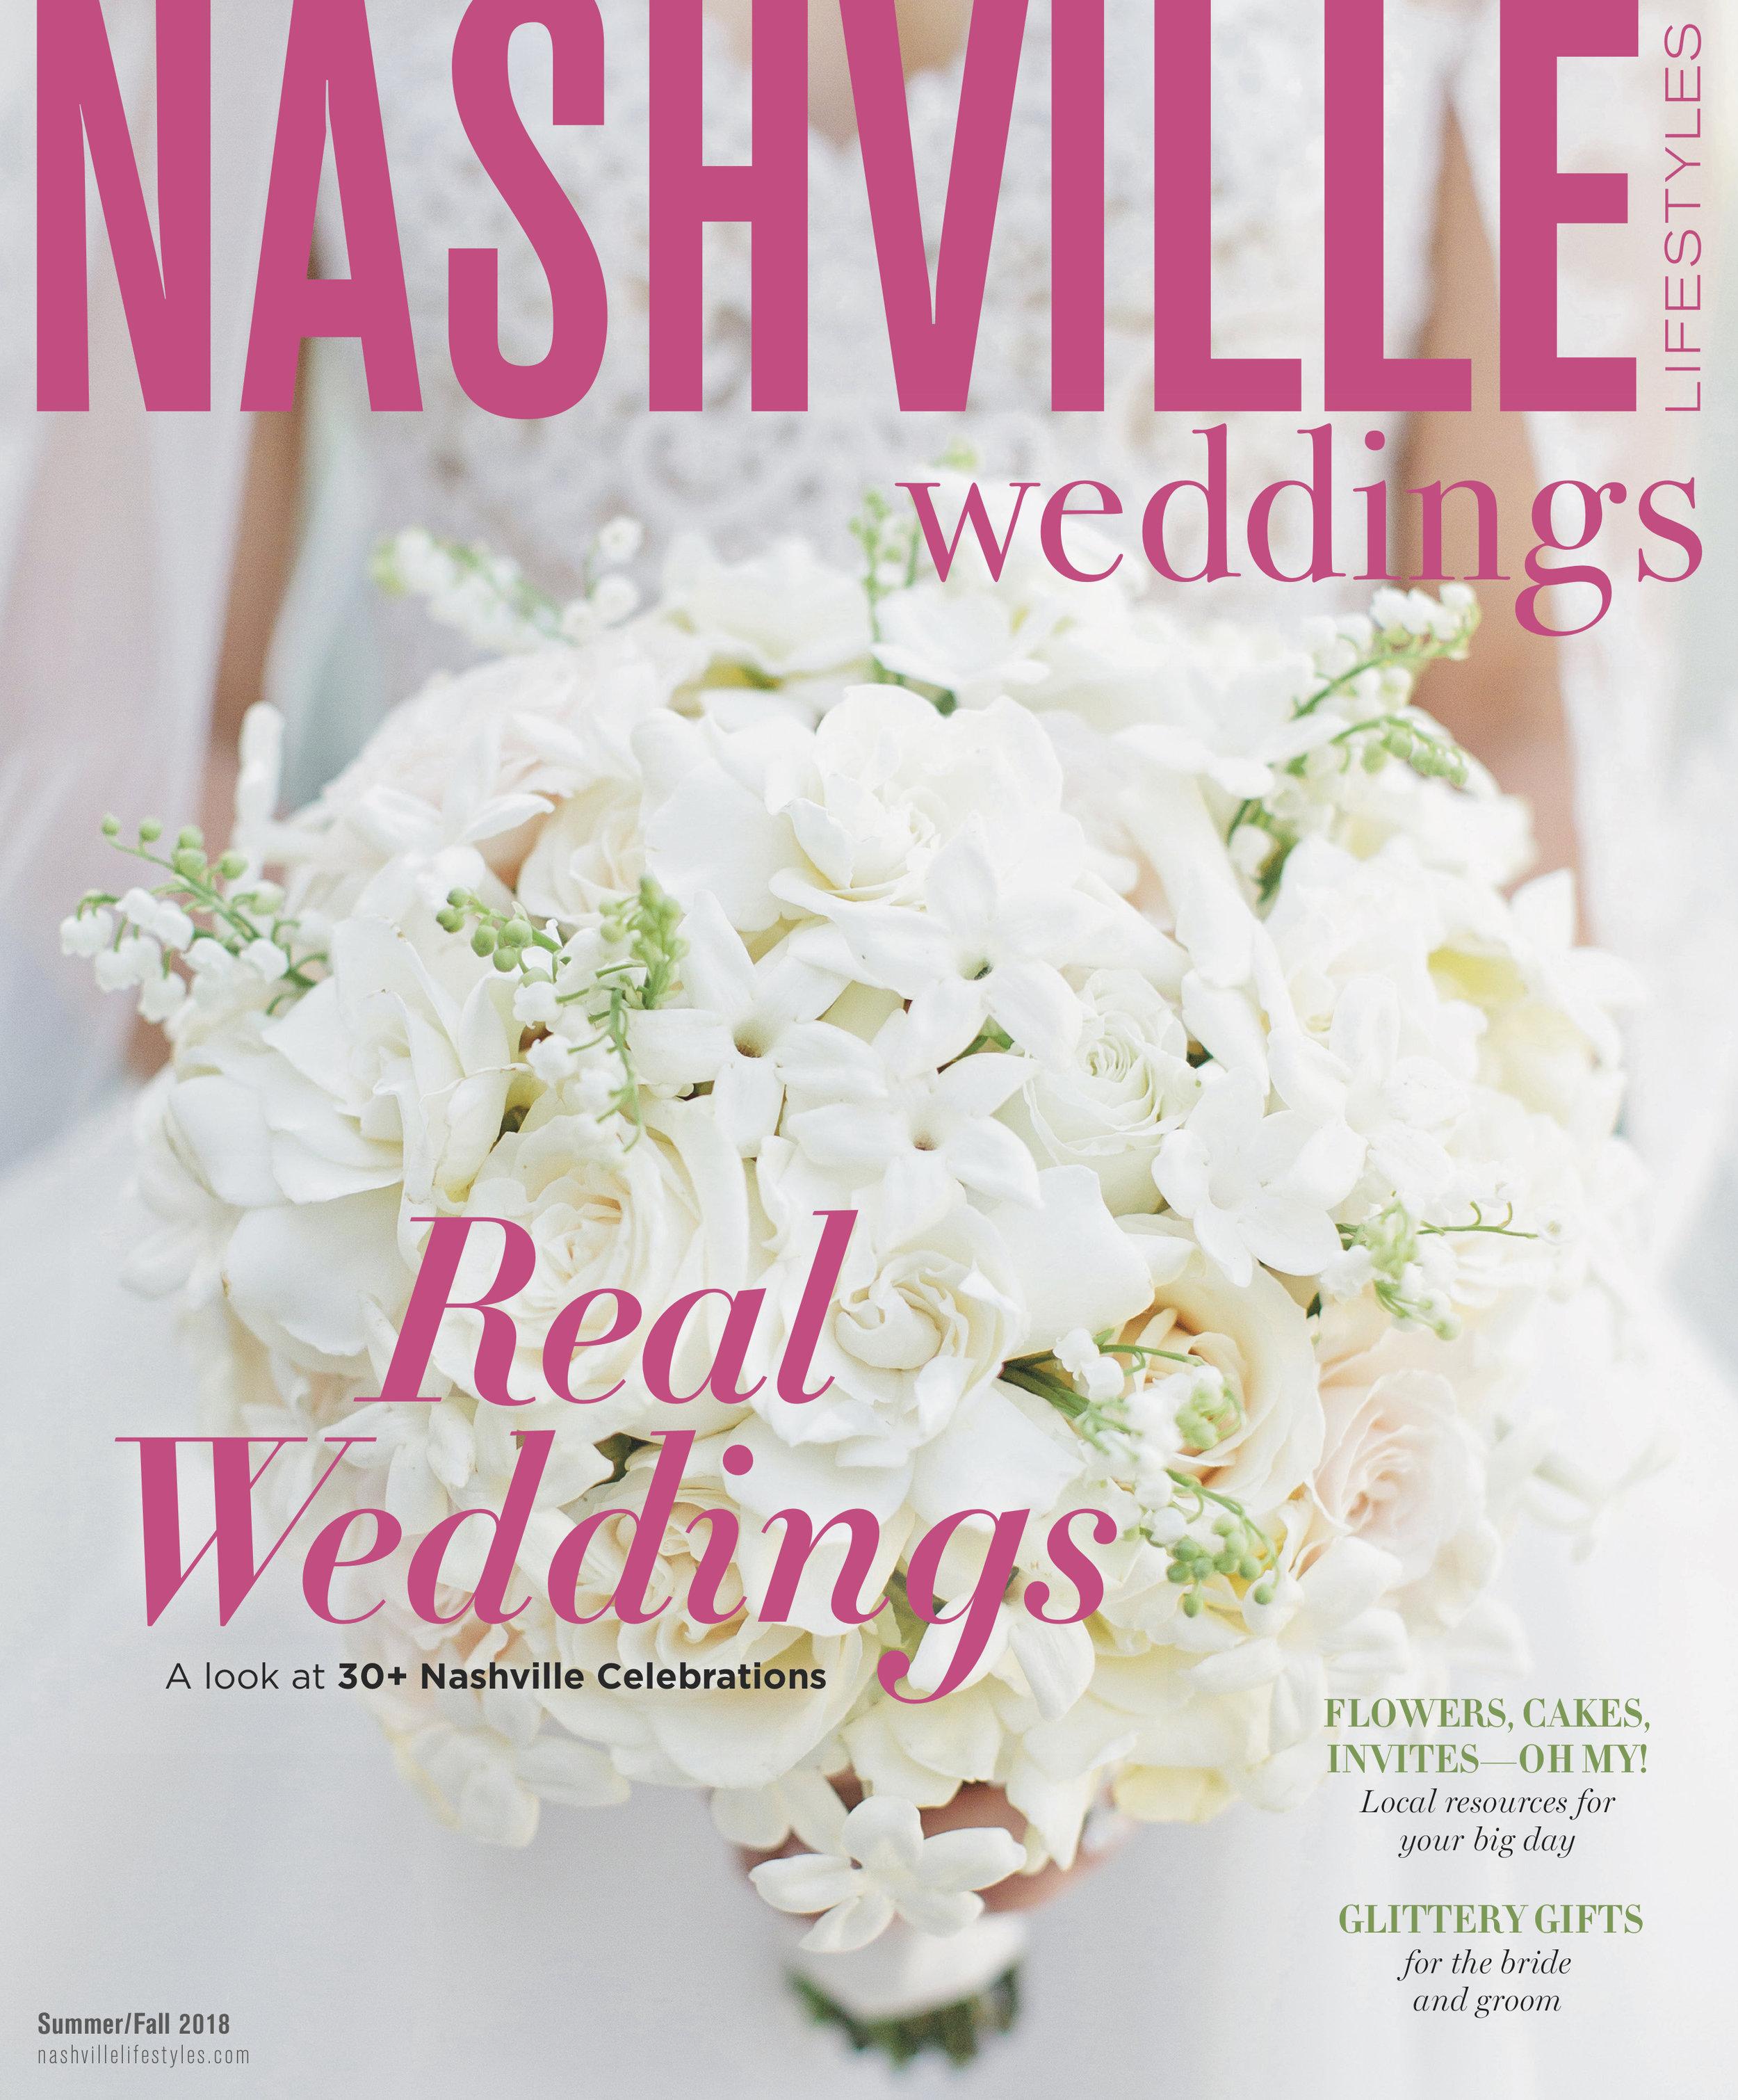 Nashville Lifestyle Weddings.jpg